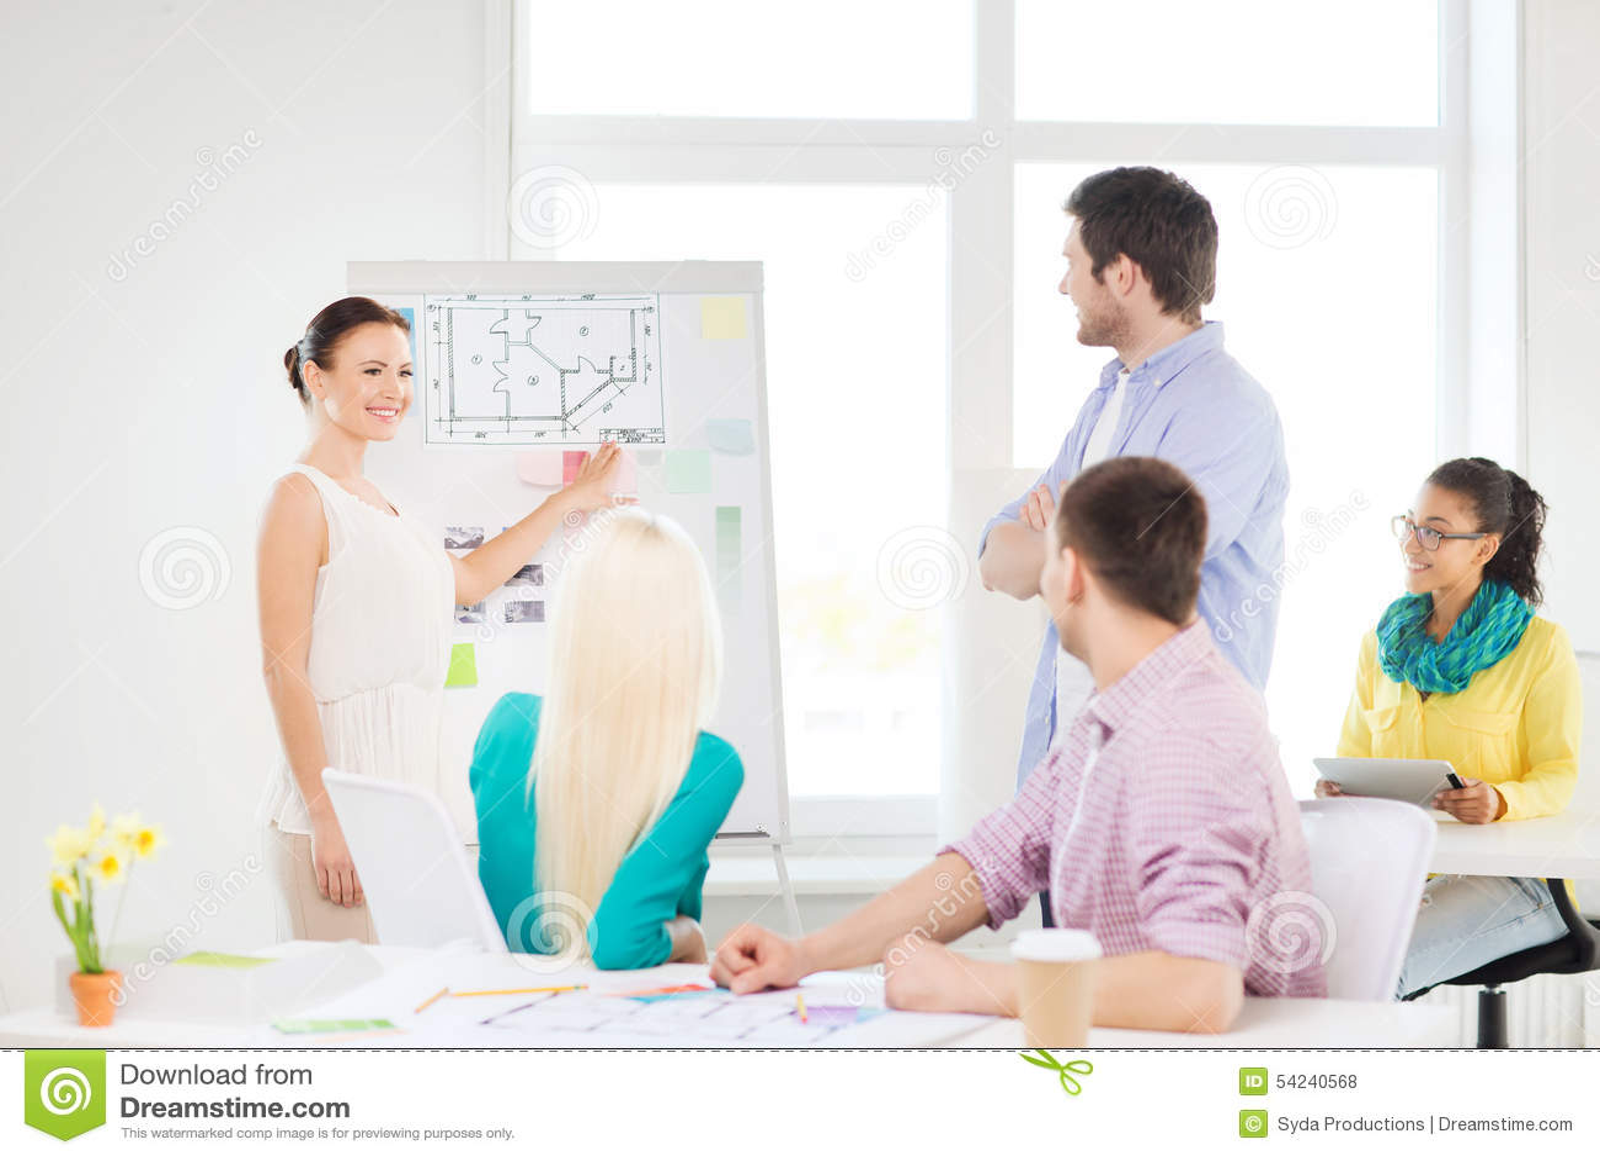 Interior designers having meeting in office stock for Interior designer education